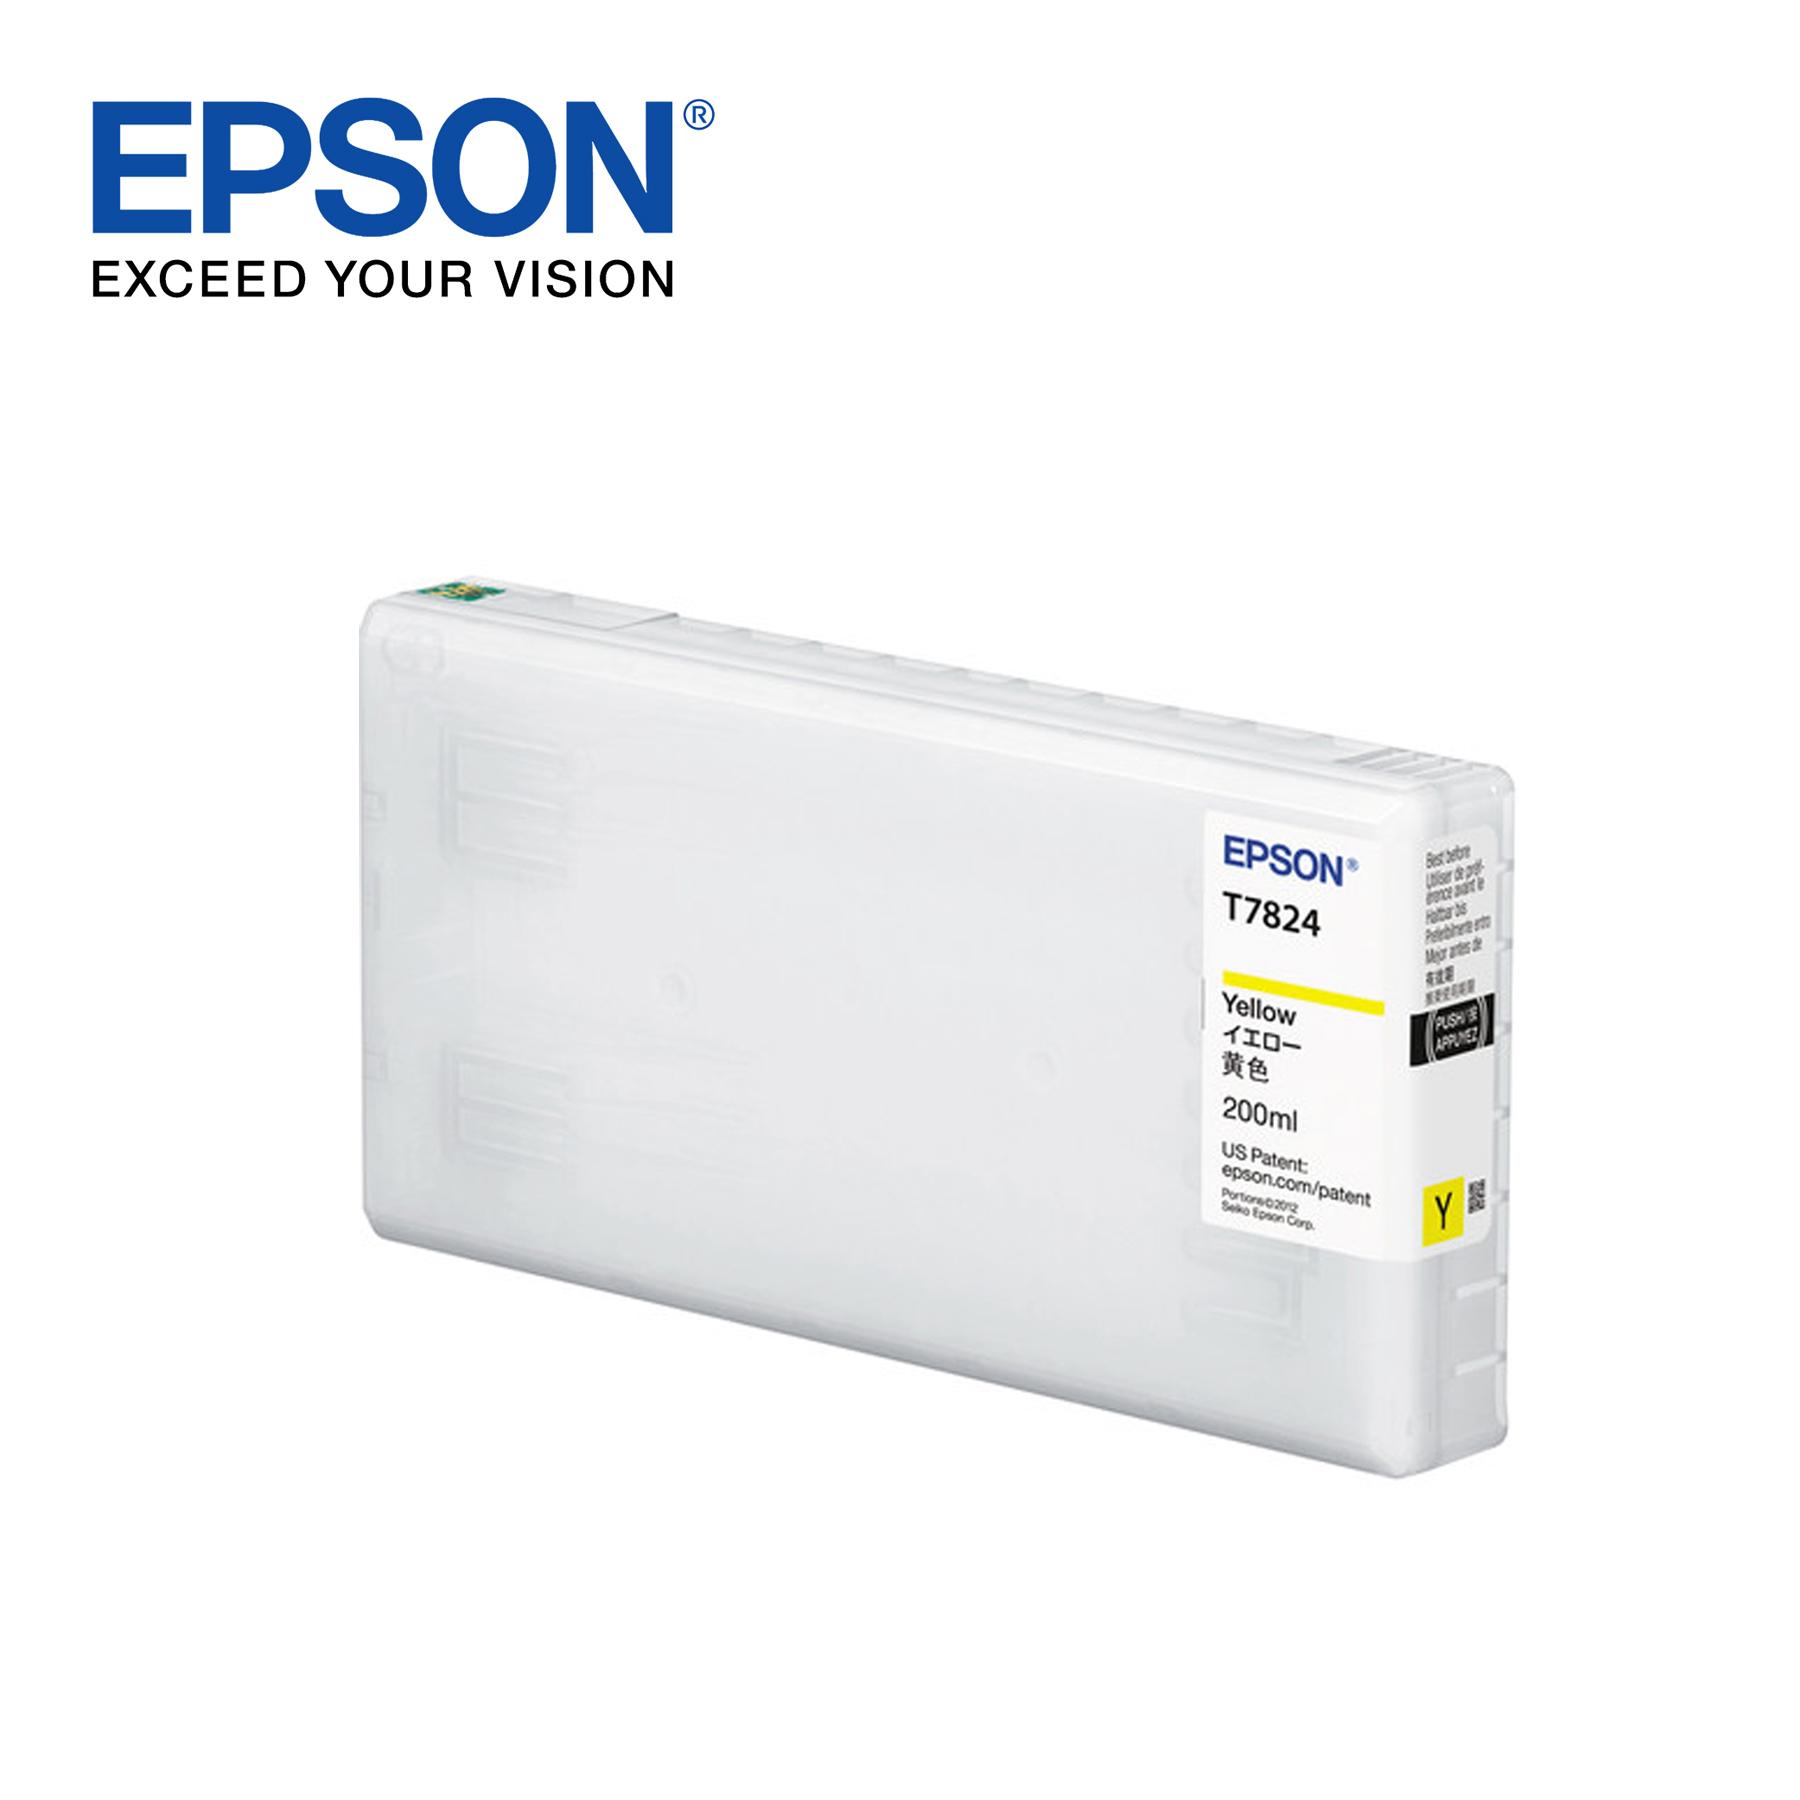 Epson Ink Cartridge for Surelab SL-D700 Photo Printer – Yellow